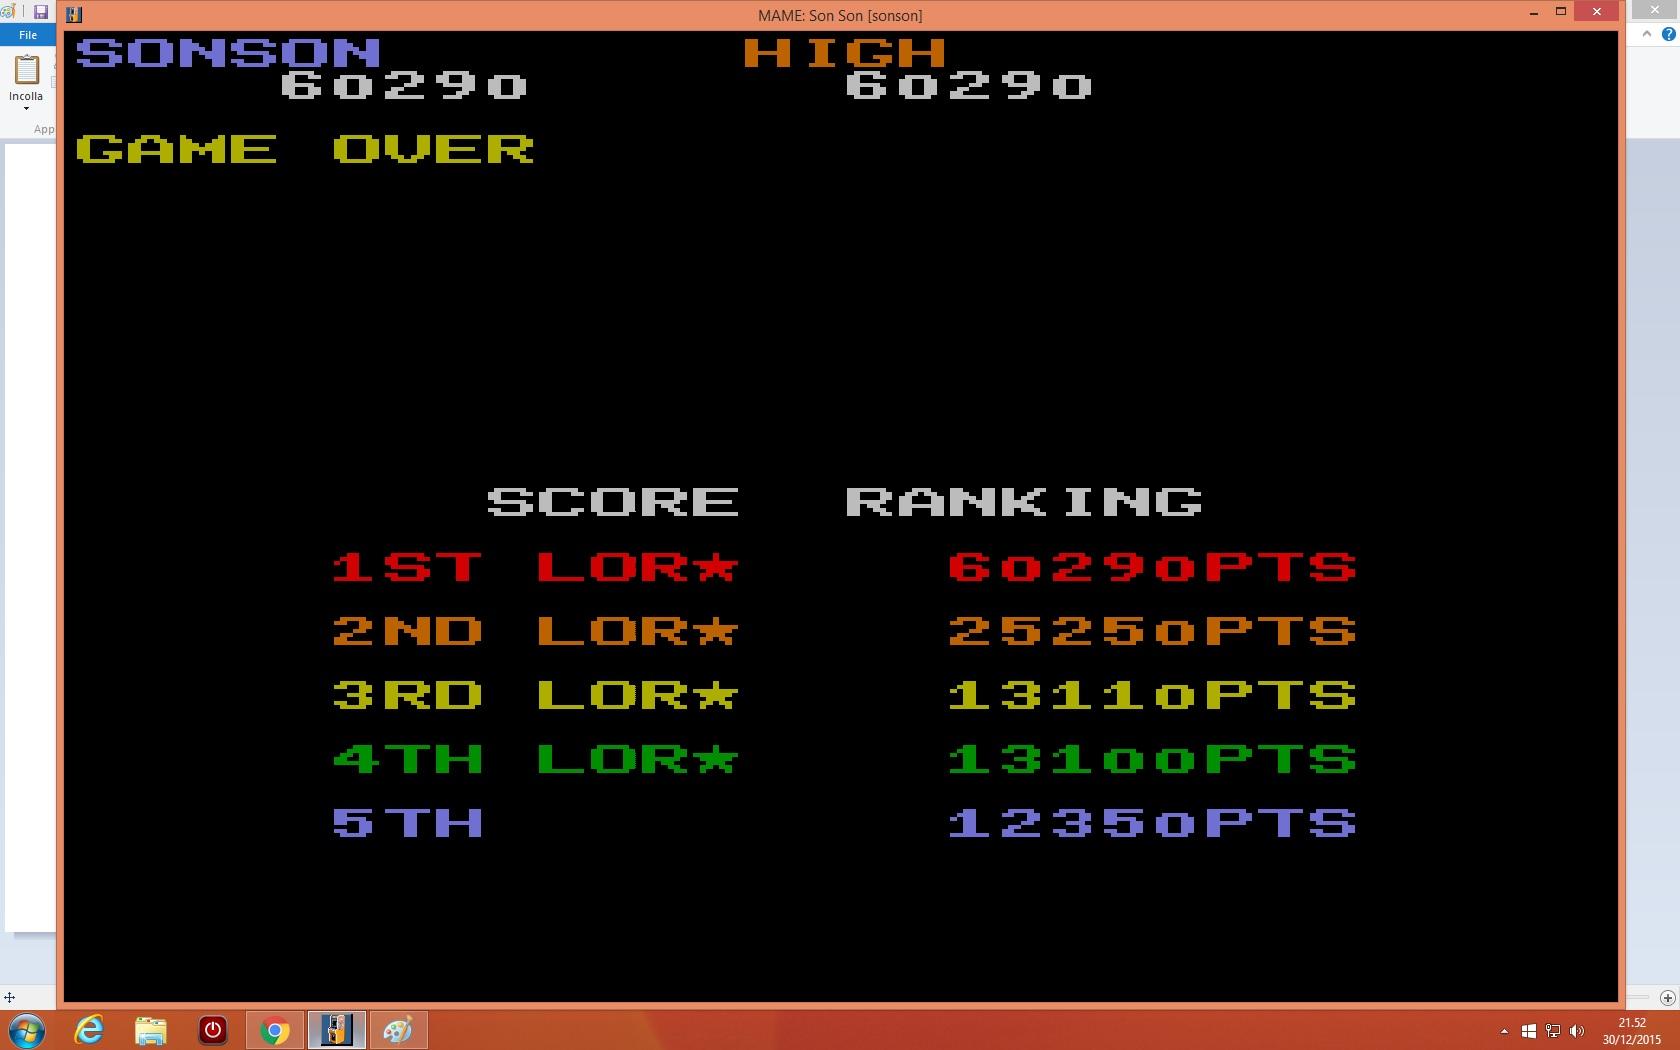 lenny2571: SonSon [sonson] (Arcade Emulated / M.A.M.E.) 60,290 points on 2015-12-30 14:52:46